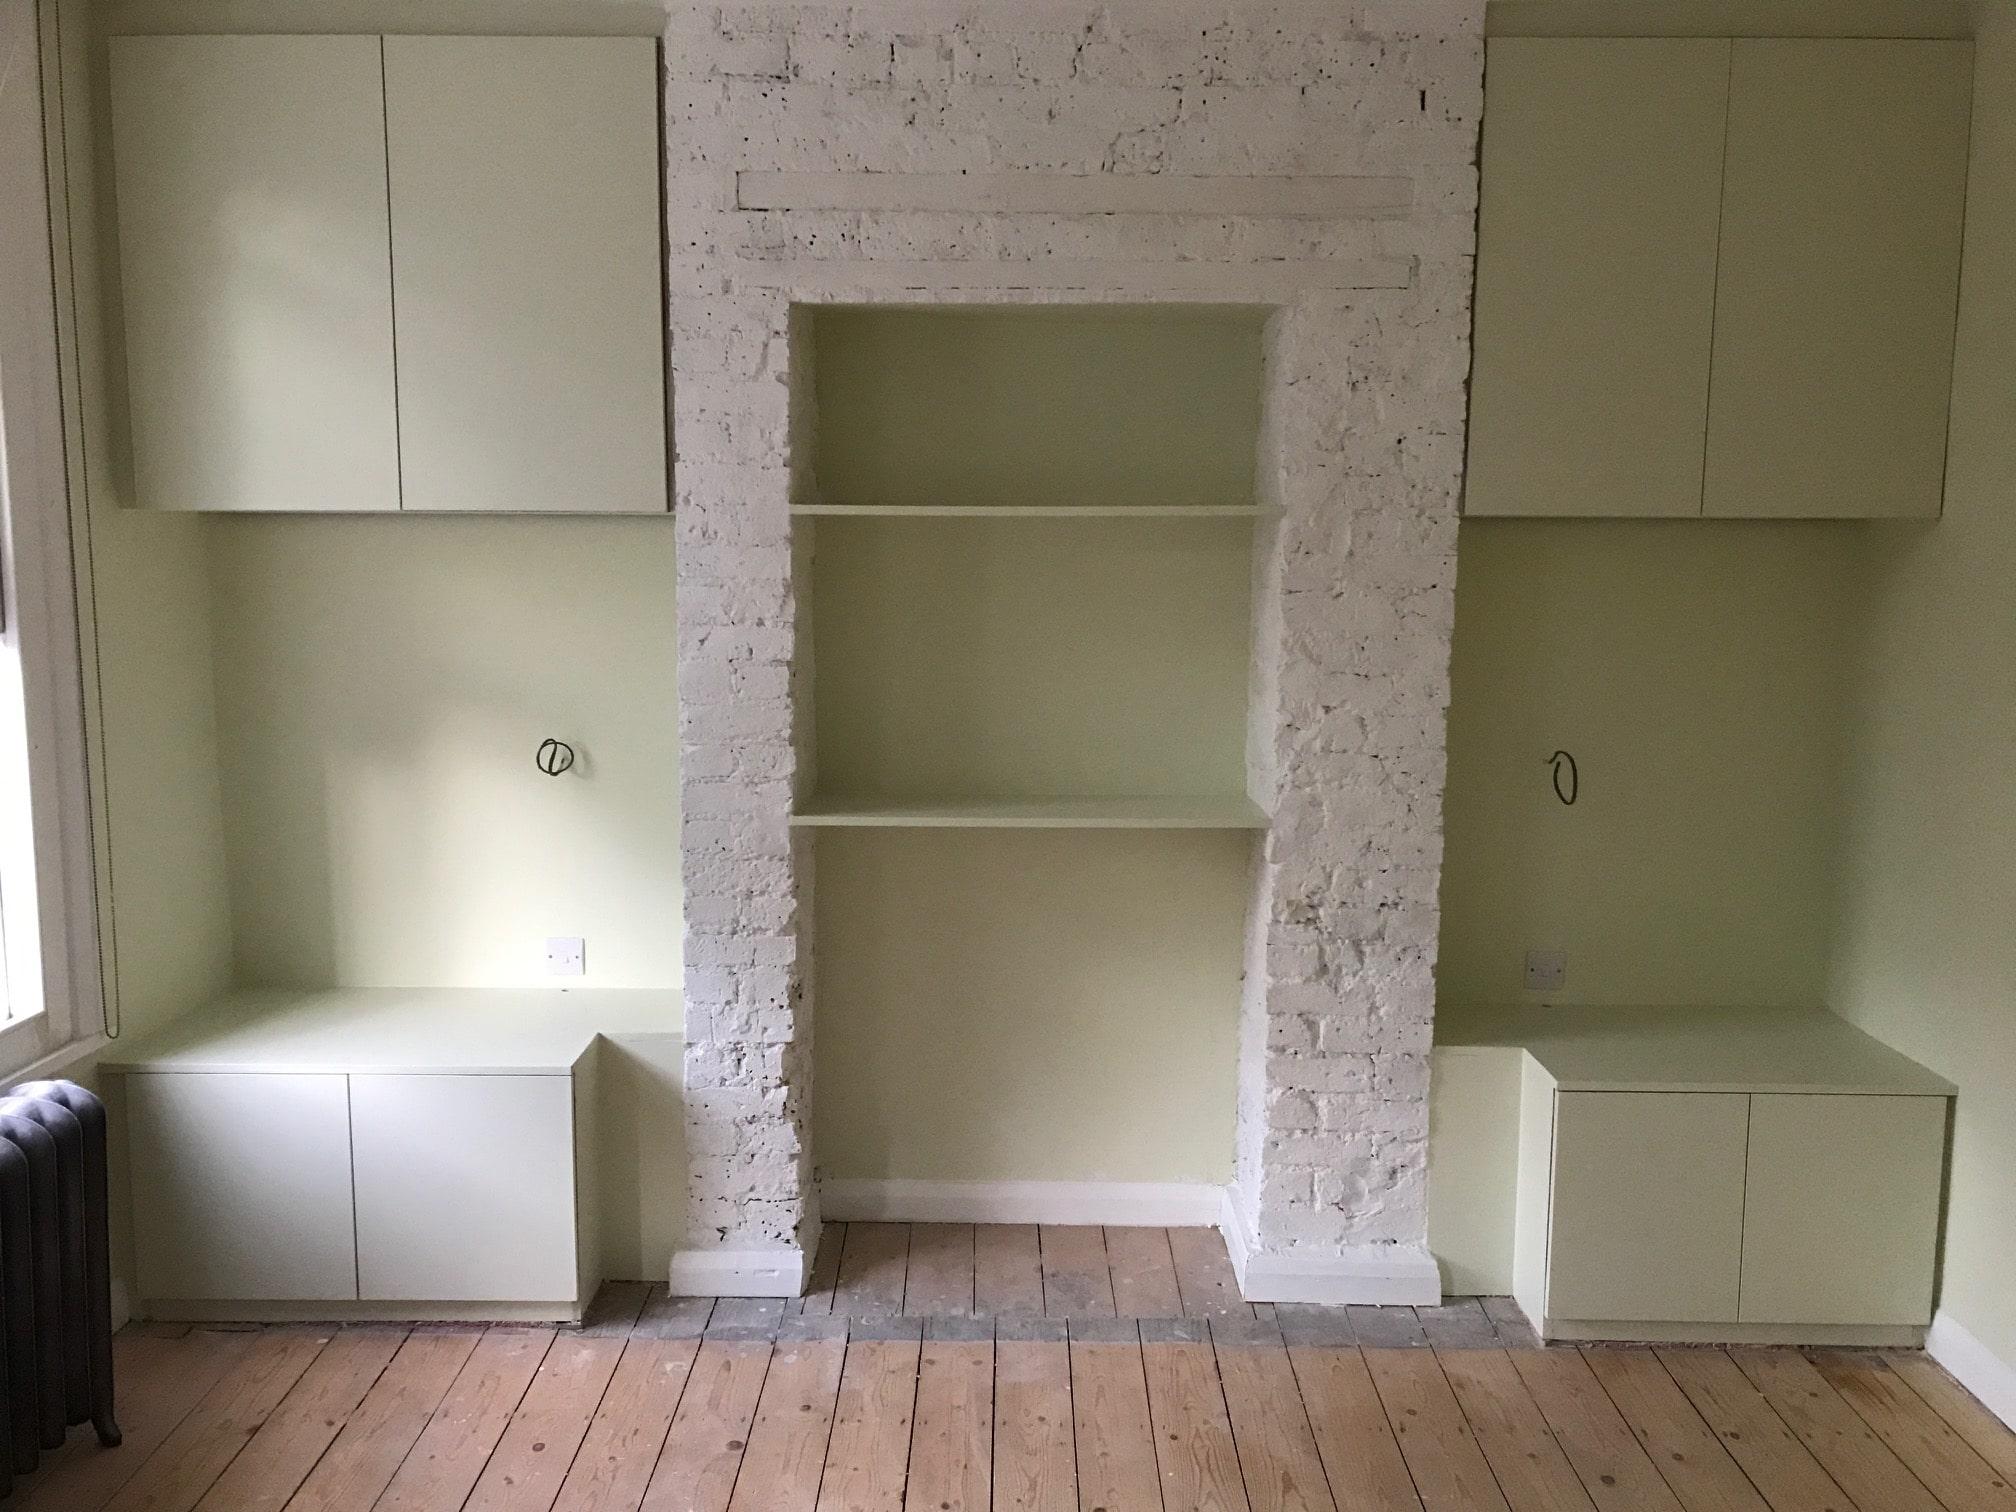 Bespoke bedroom cupboards and shelving